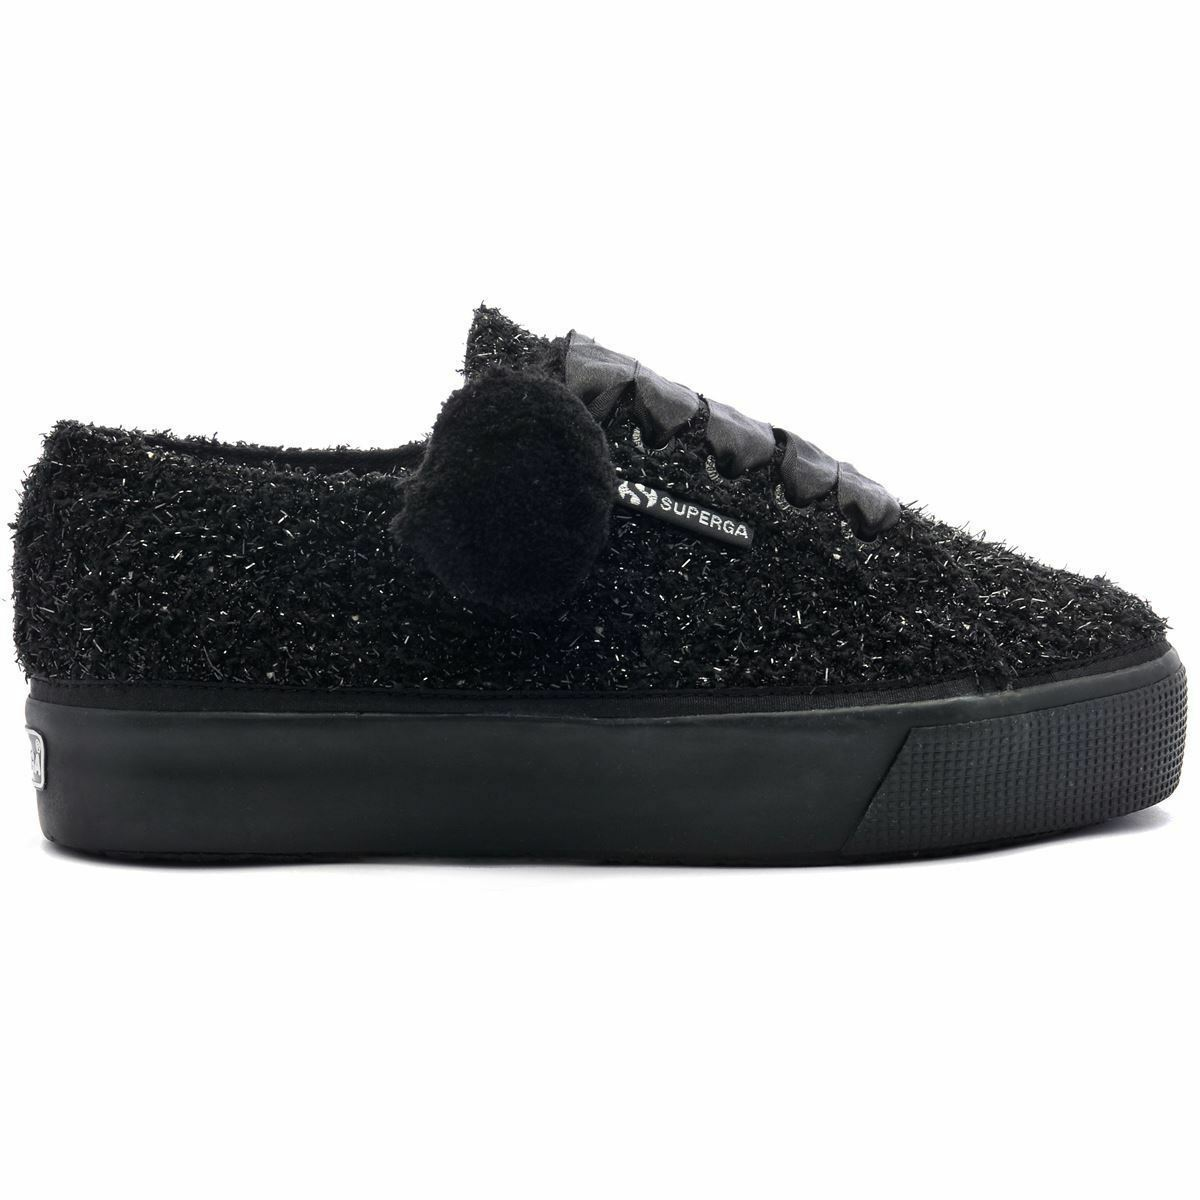 Superga 2730-SHINYBOUCLECOFURW zapatillas zapatillas 2730-SHINYBOUCLECOFURW mujer fondo Danilo Paura e691e1